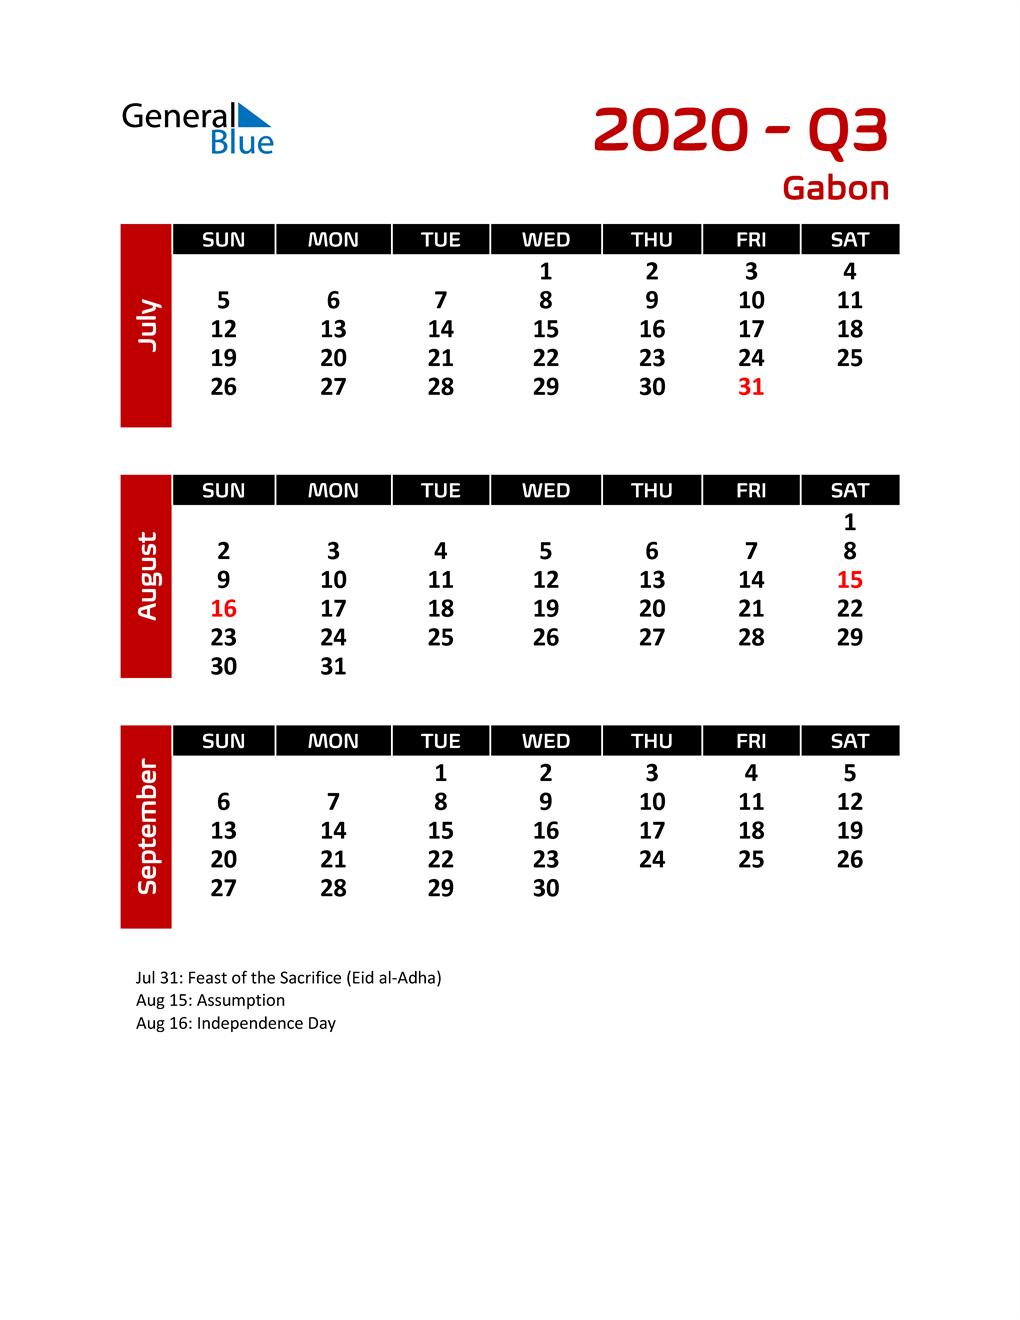 Q3 2020 Calendar with Holidays